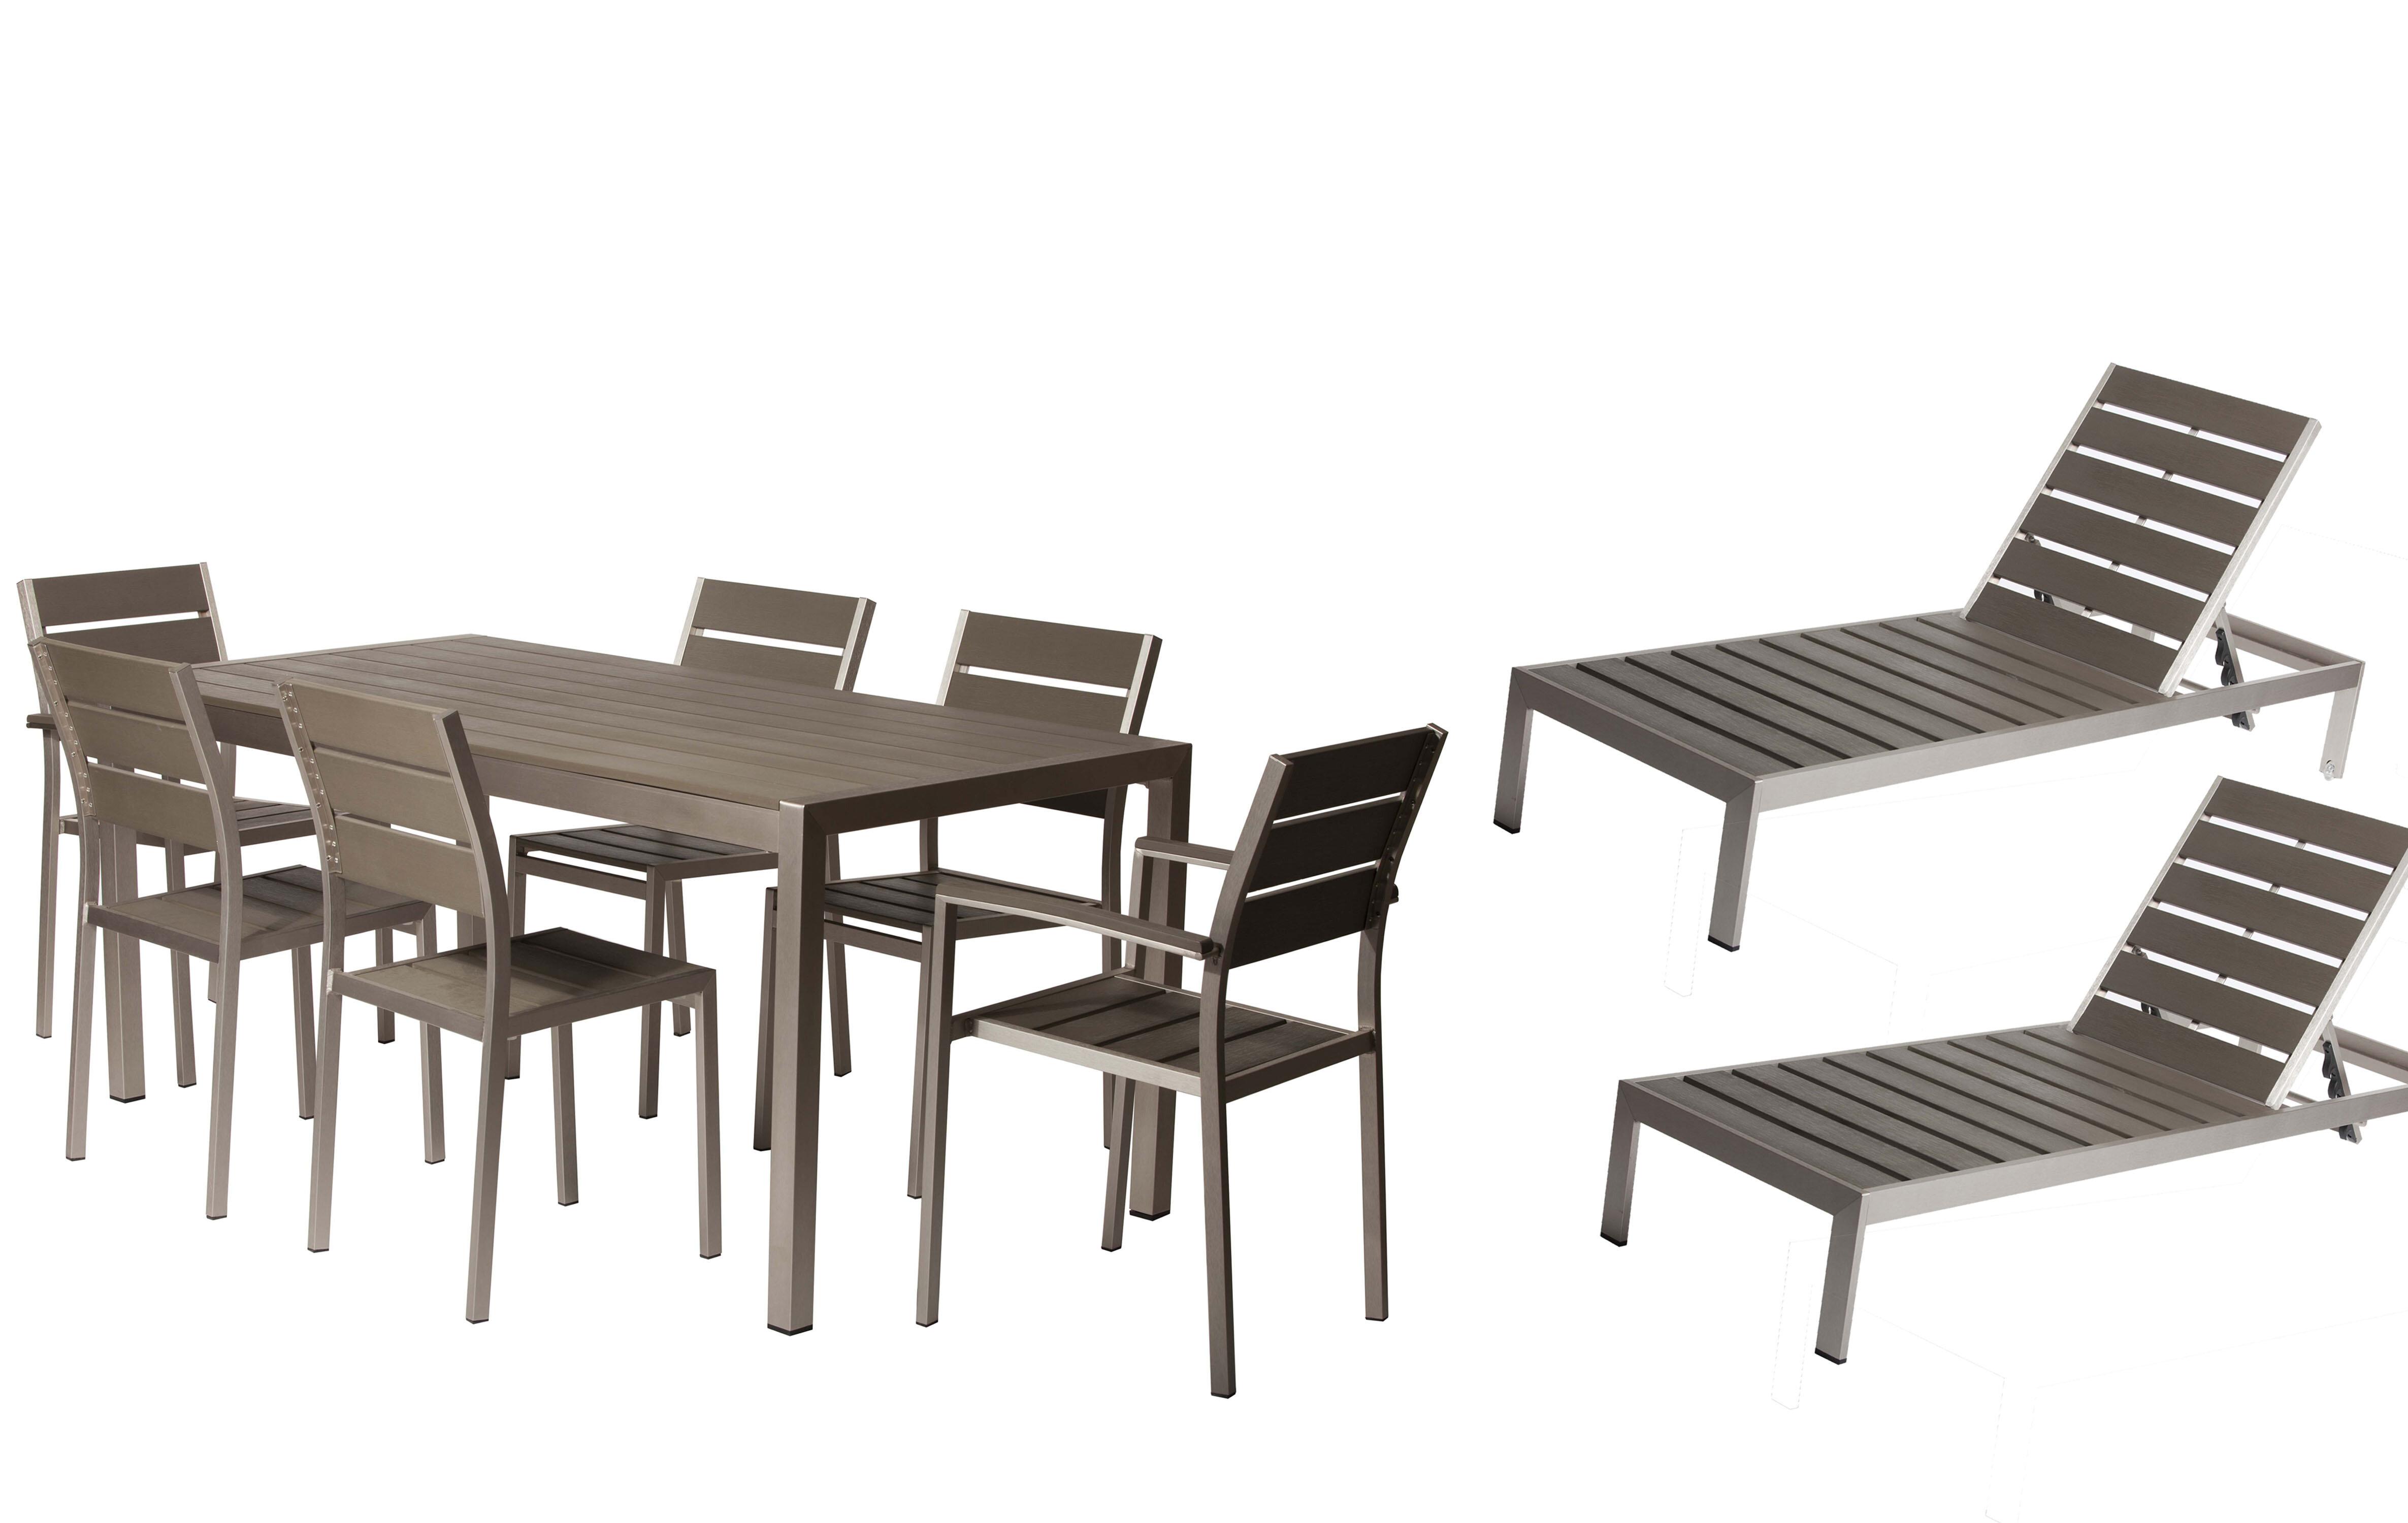 Orren ellis carrell 9 piece patio set wayfair